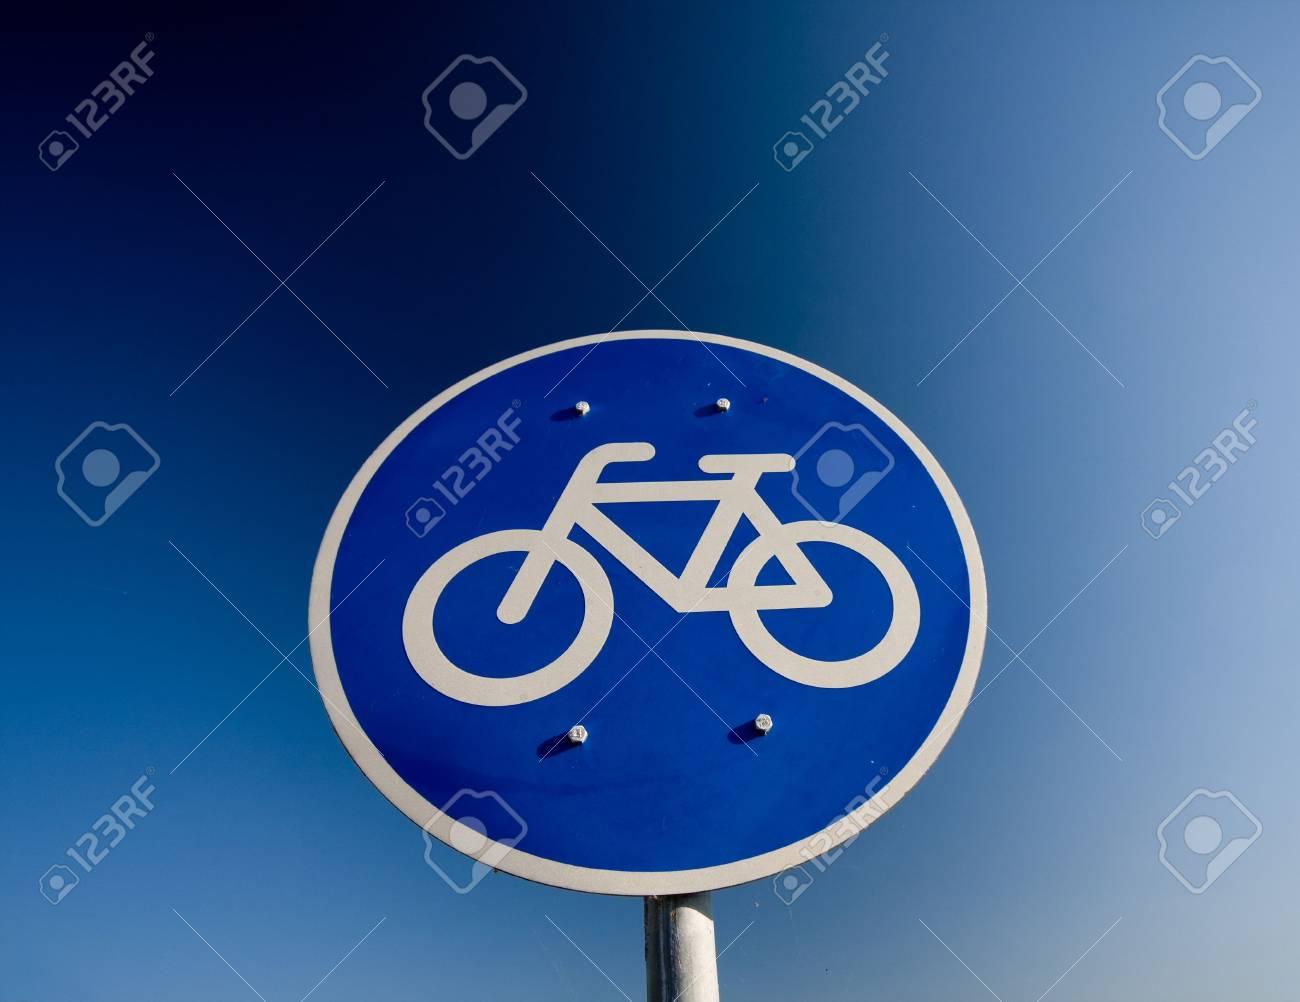 Bike lane traffic sign over blue sky Stock Photo - 6239492